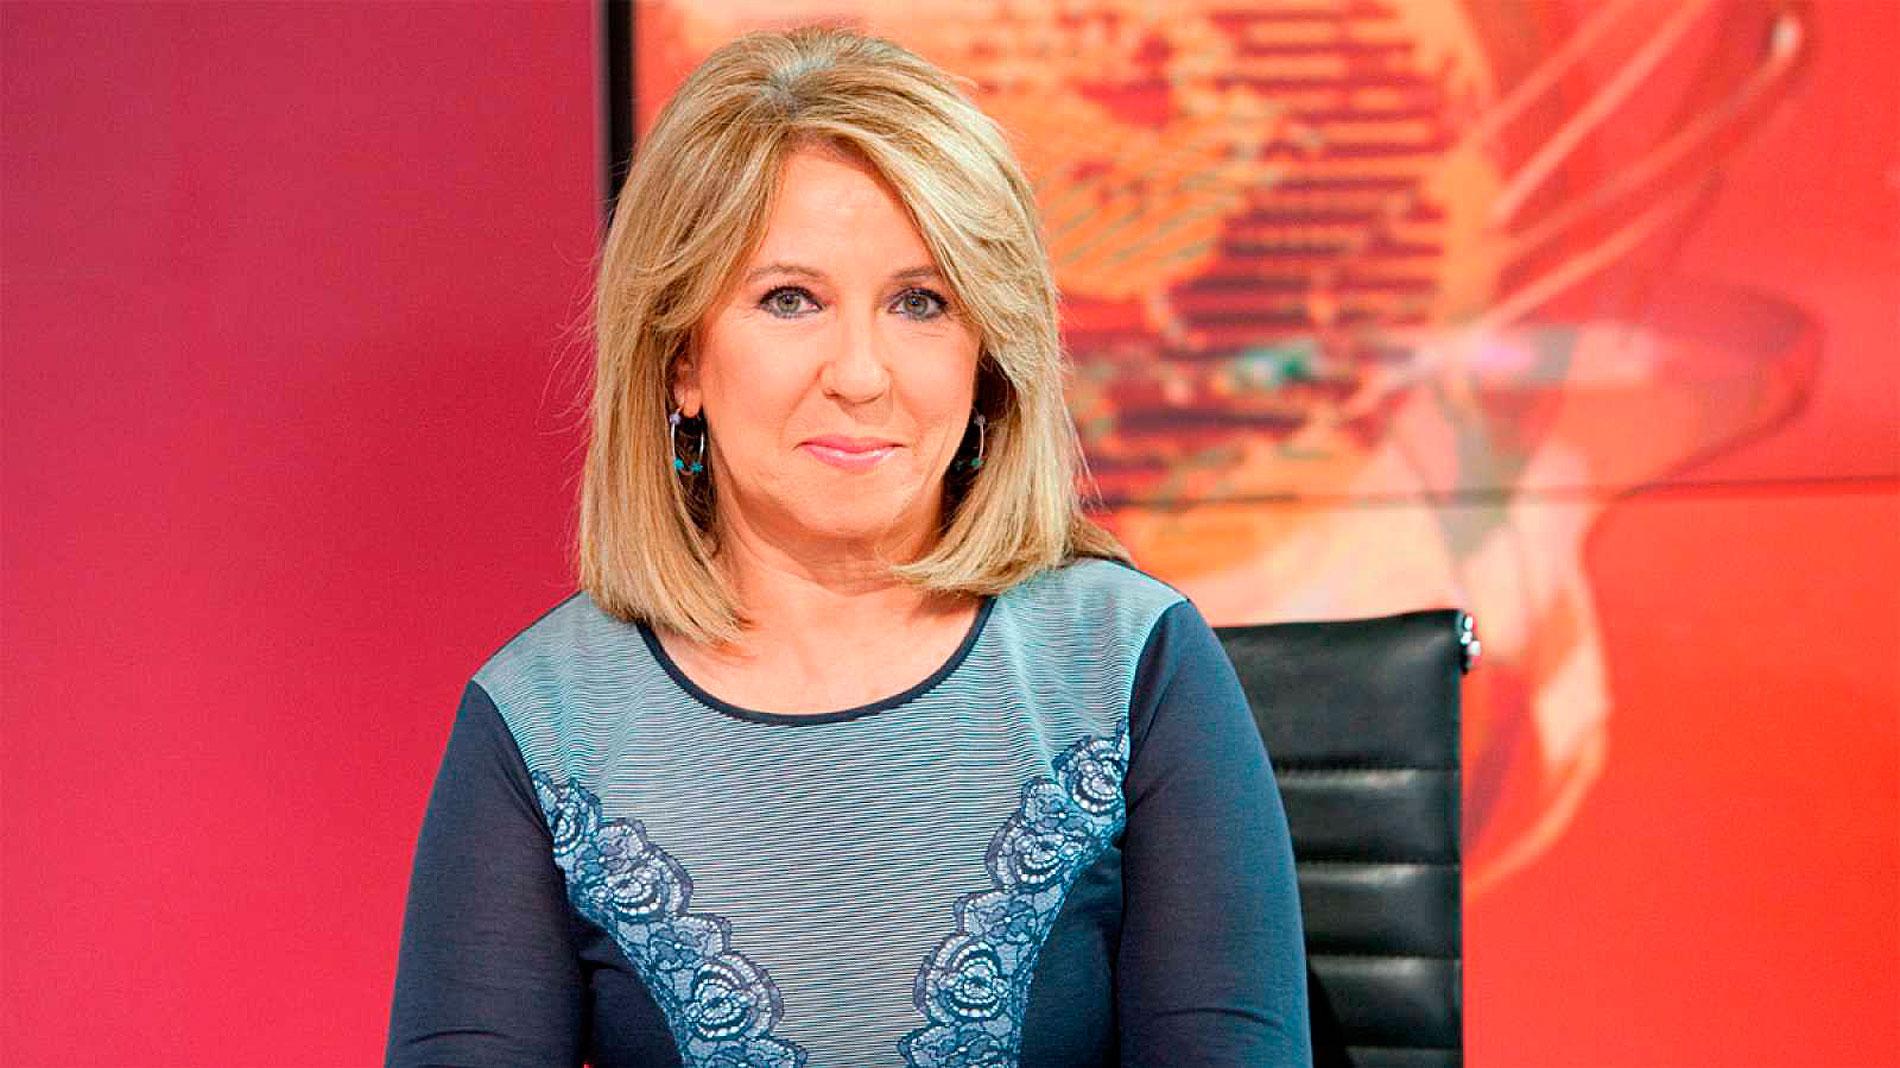 Adiós a Alicia Gómez Montano, periodista de RTVE